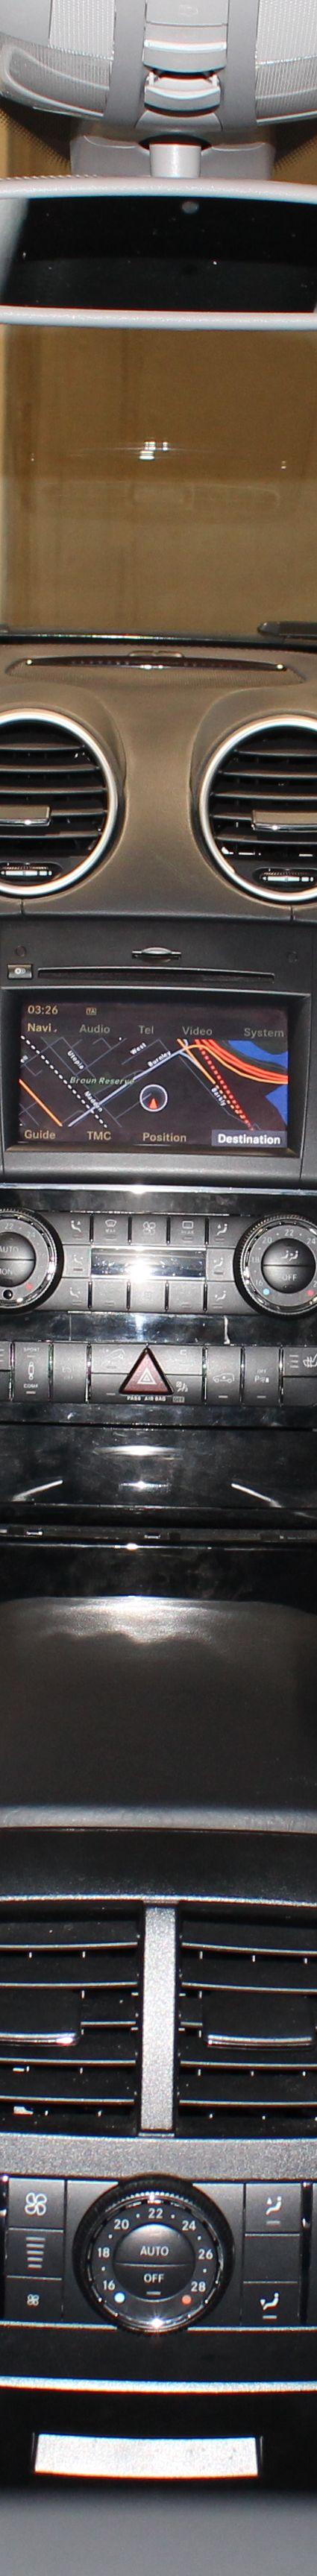 2009 MERCEDES ML63 AMG- for sale in Australia